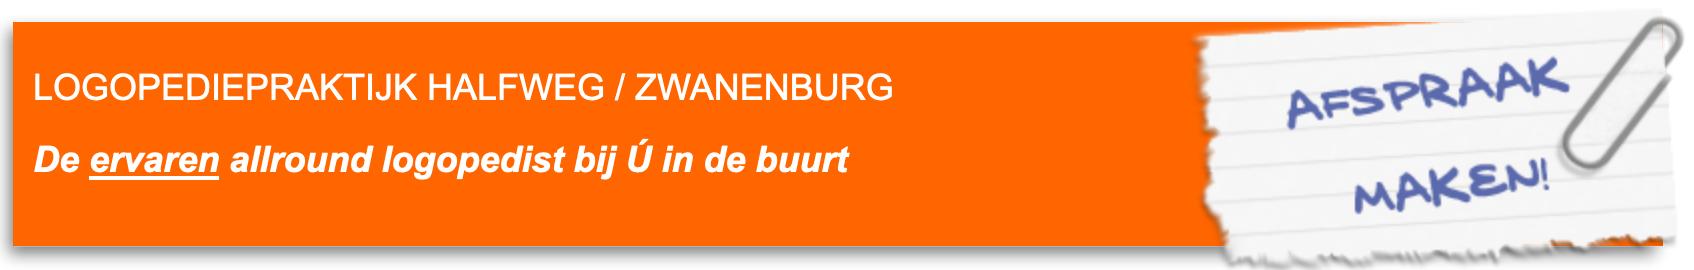 Logopedie Praktijk Halfweg / Zwanenburg